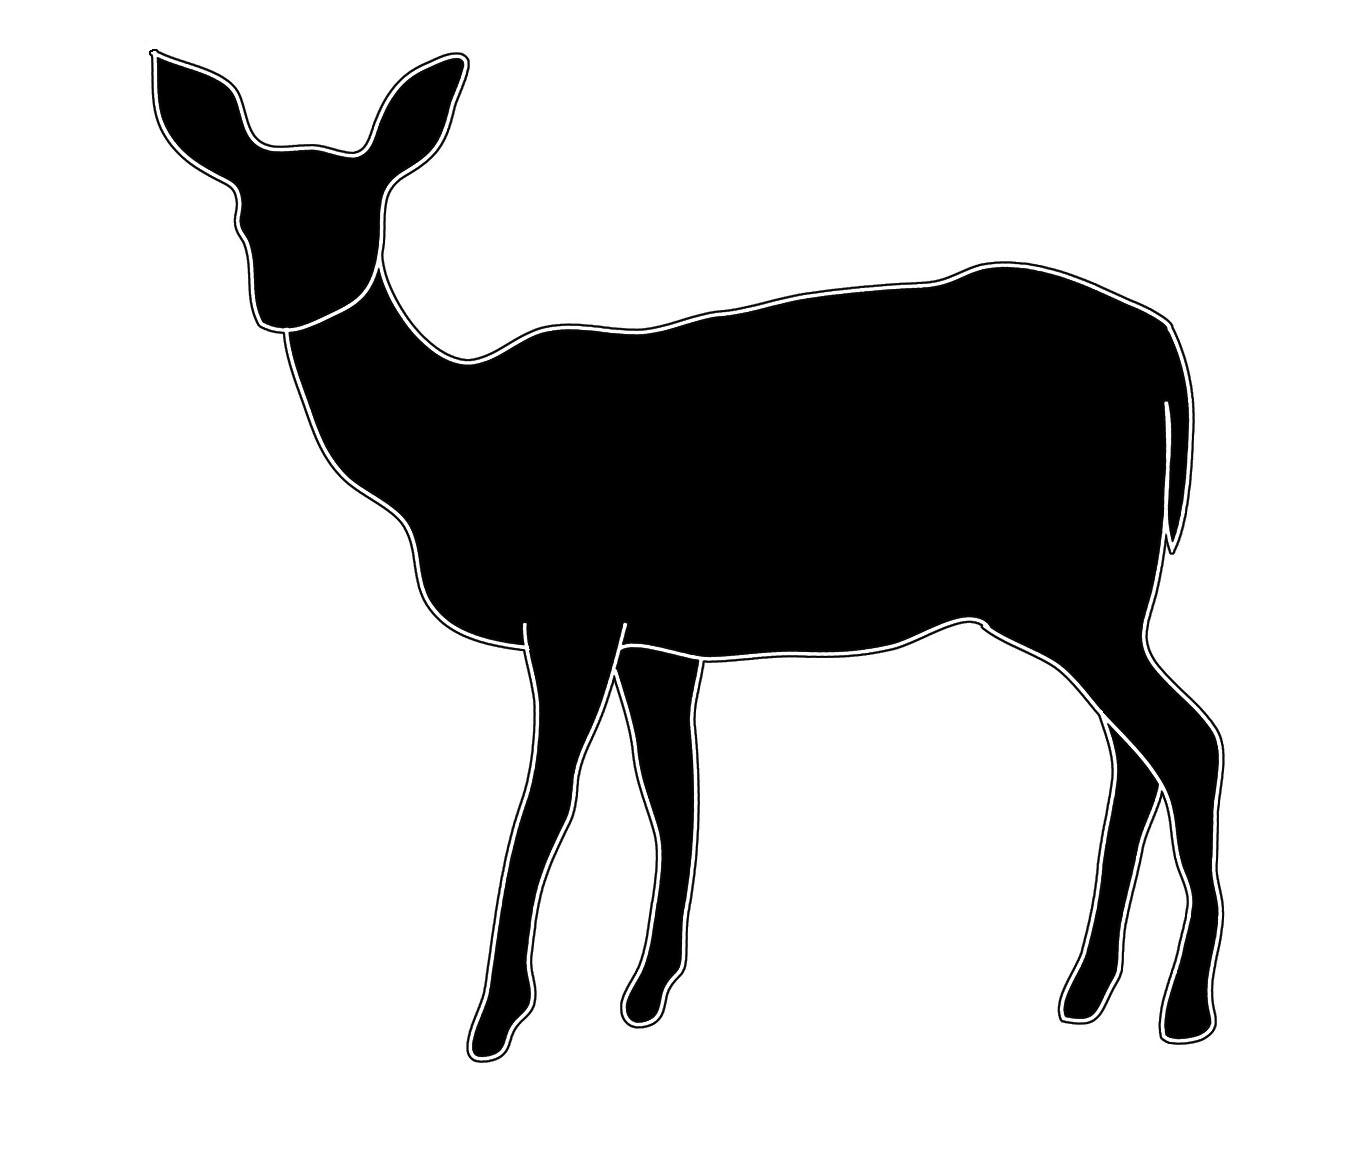 1349x1173 Clip Art Deer Head Silhouette Clip Art